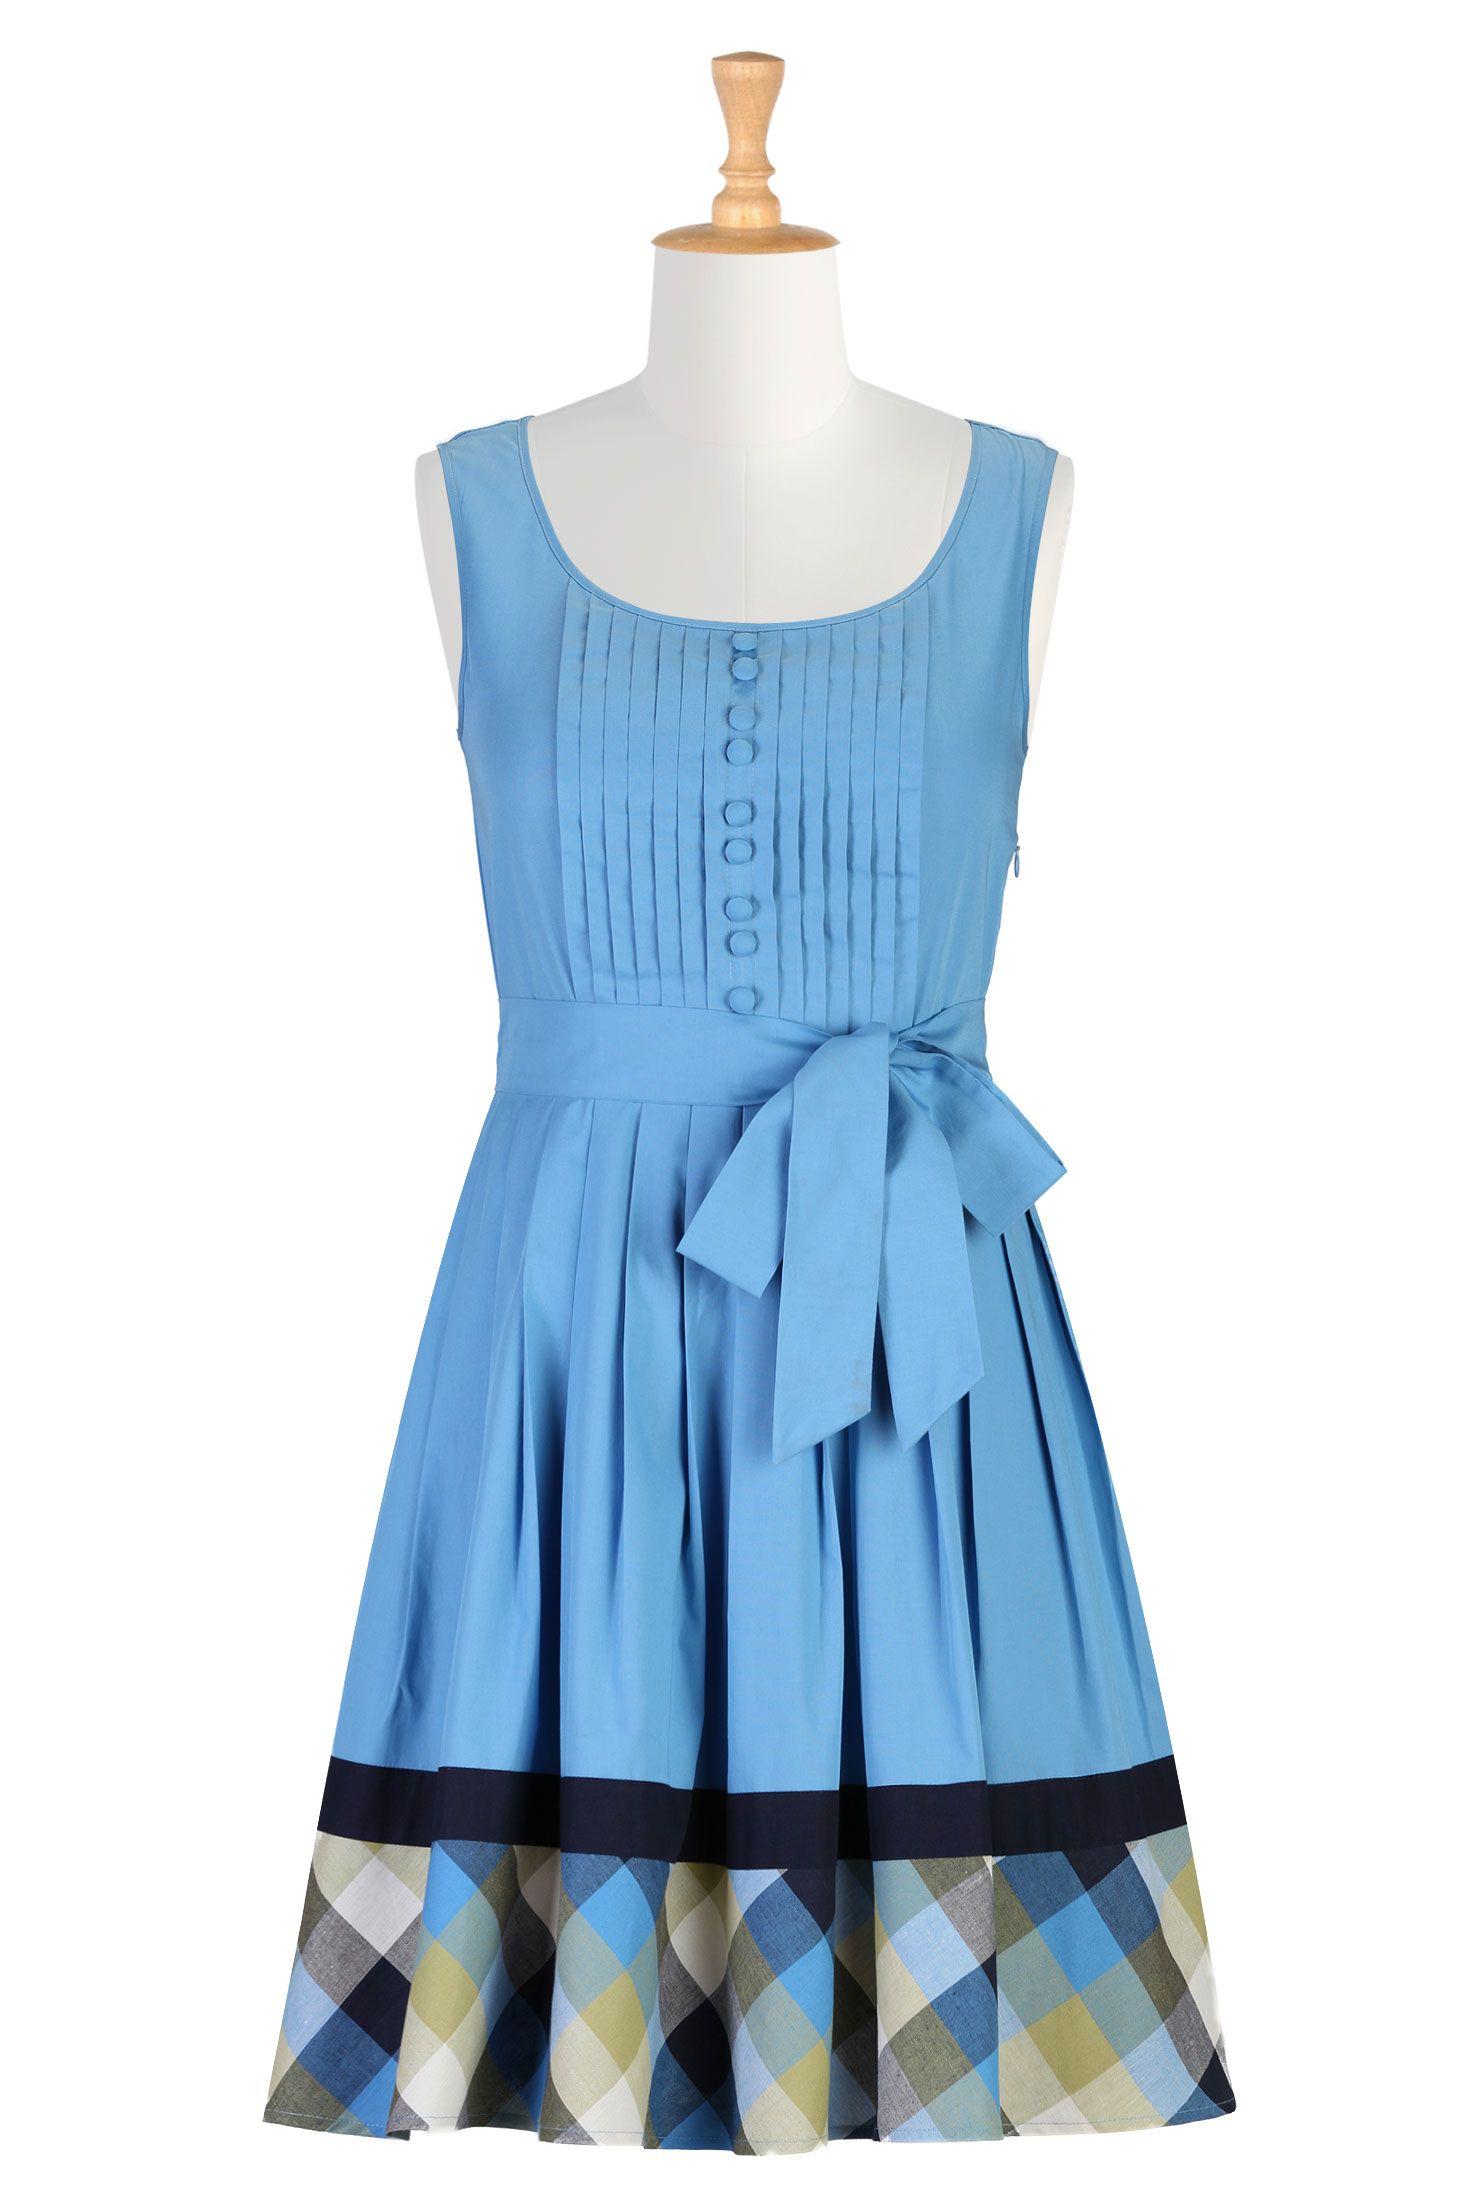 Plaid trim poplin dress | Modest outfits, Beautiful clothes and Plaid